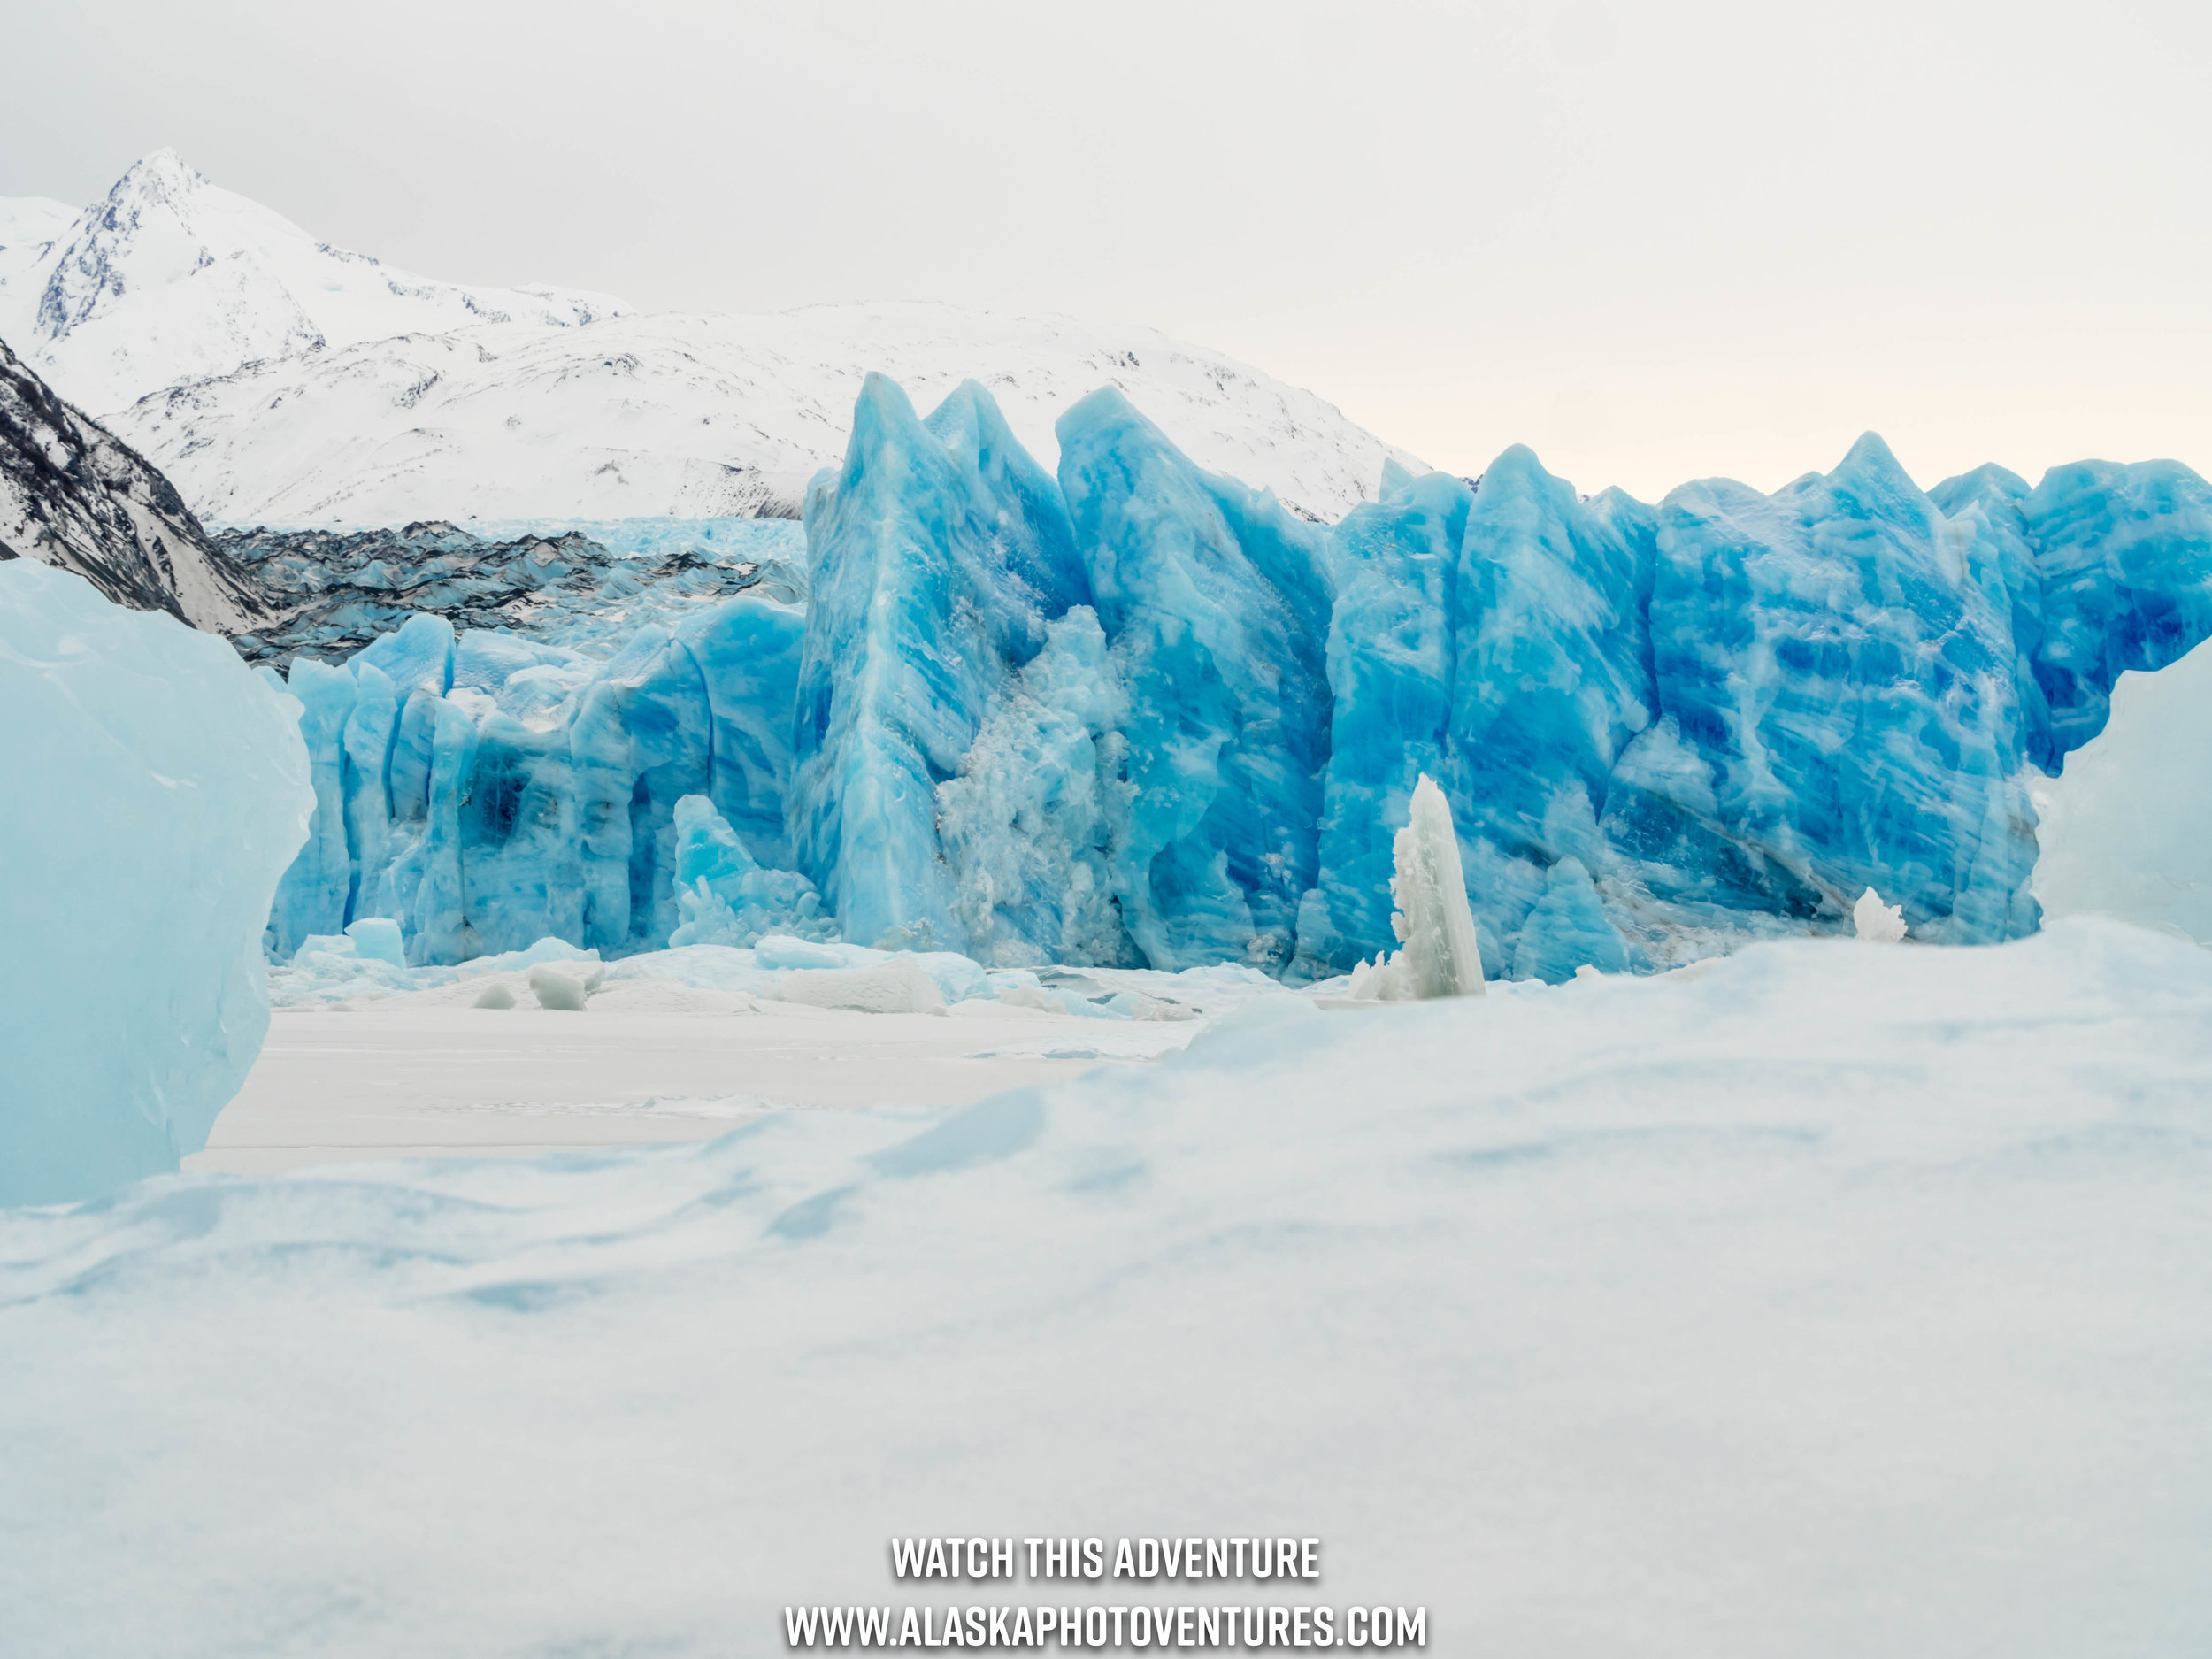 colony-glacier-adventure-photography-tv-show-alaska.jpg6.jpg